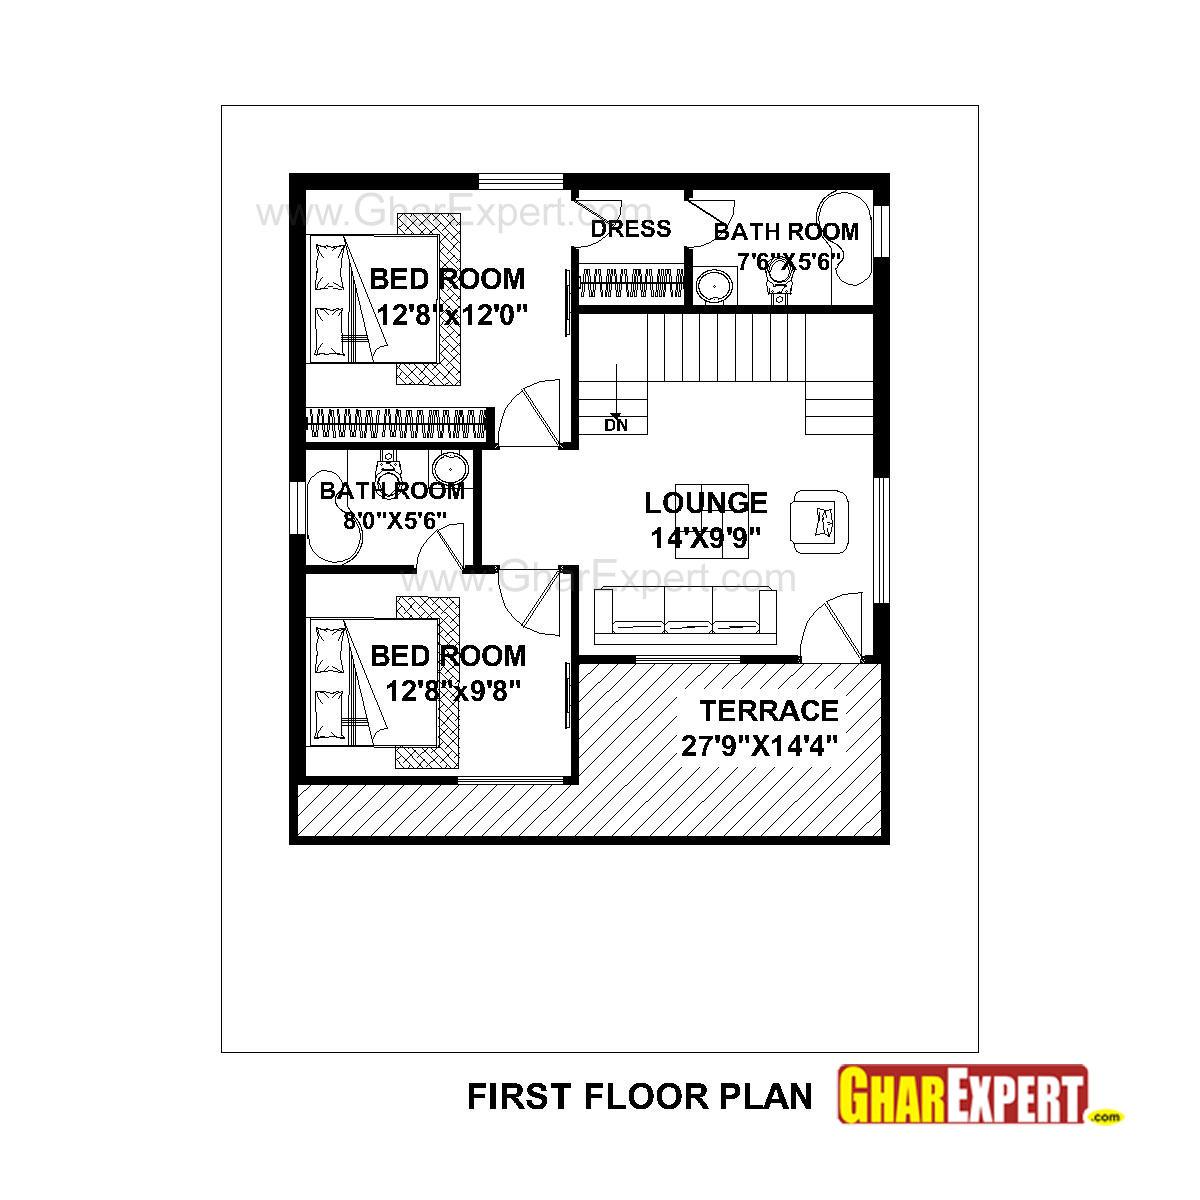 House Plan for 36 Feet by 45 Feet plot (Plot Size 180